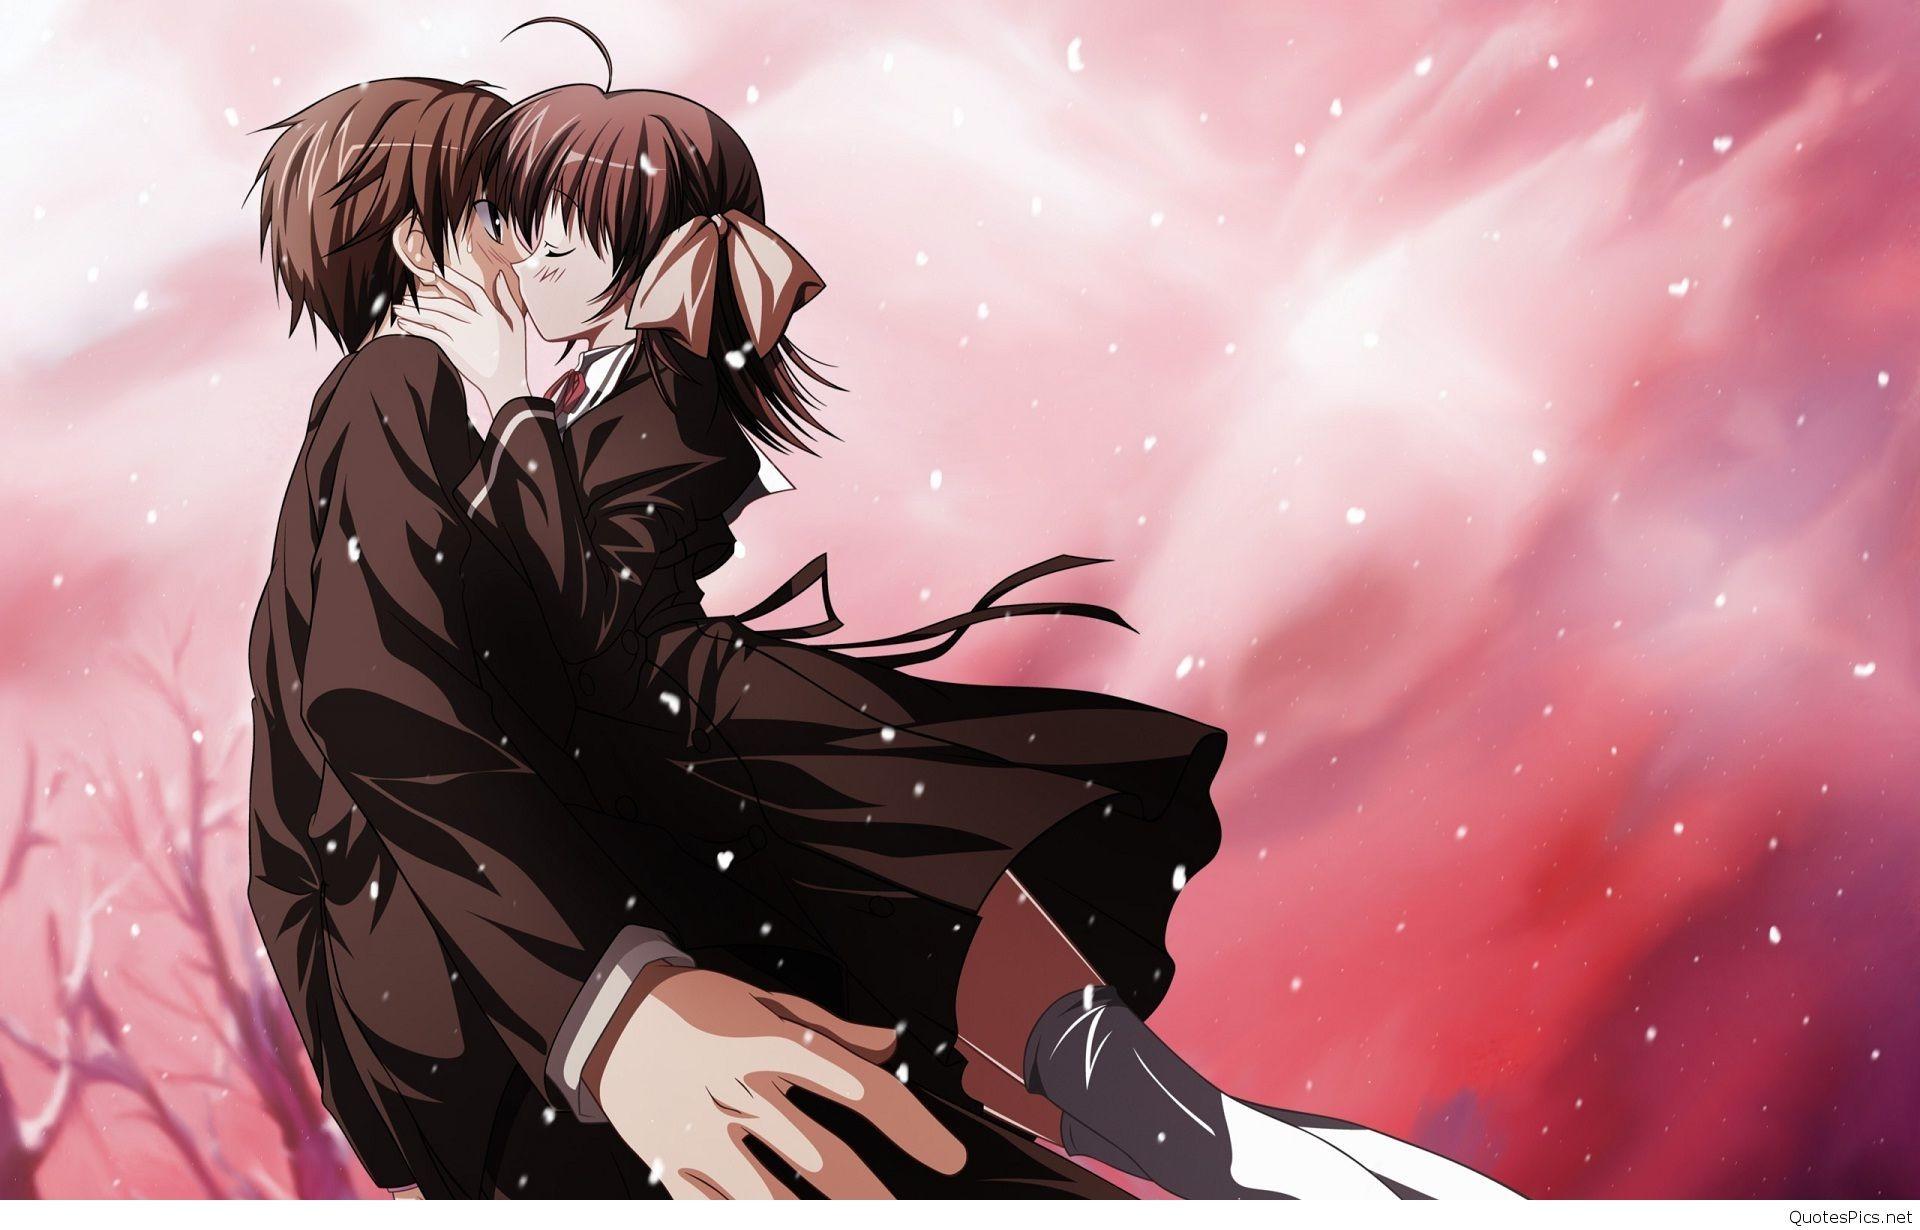 Animated-cartoon-couple-kissing-wallpaper